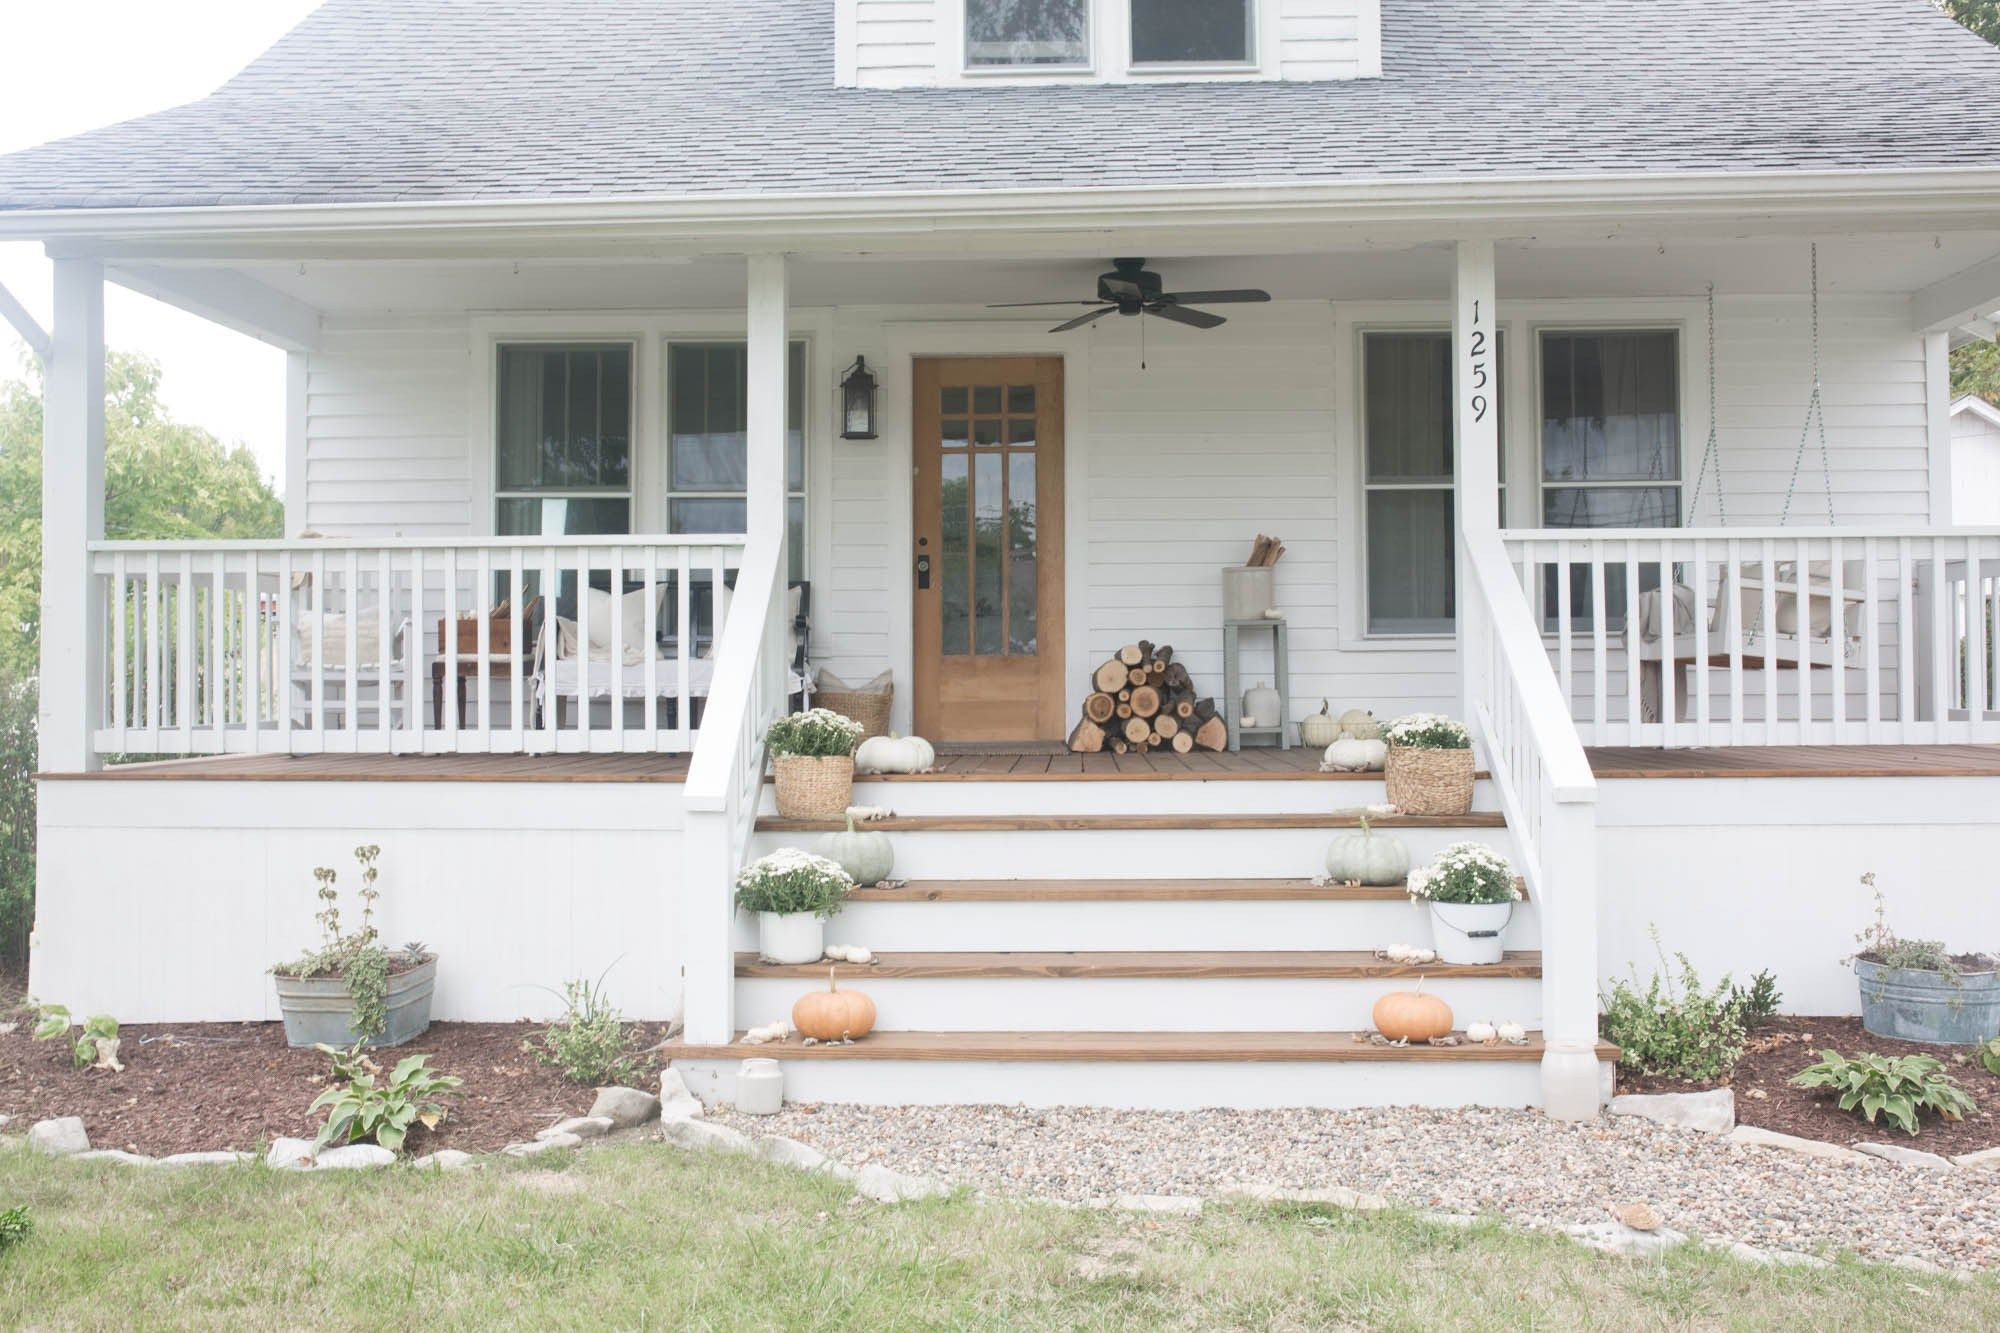 Most stylish farmhouse front door design ideas 36